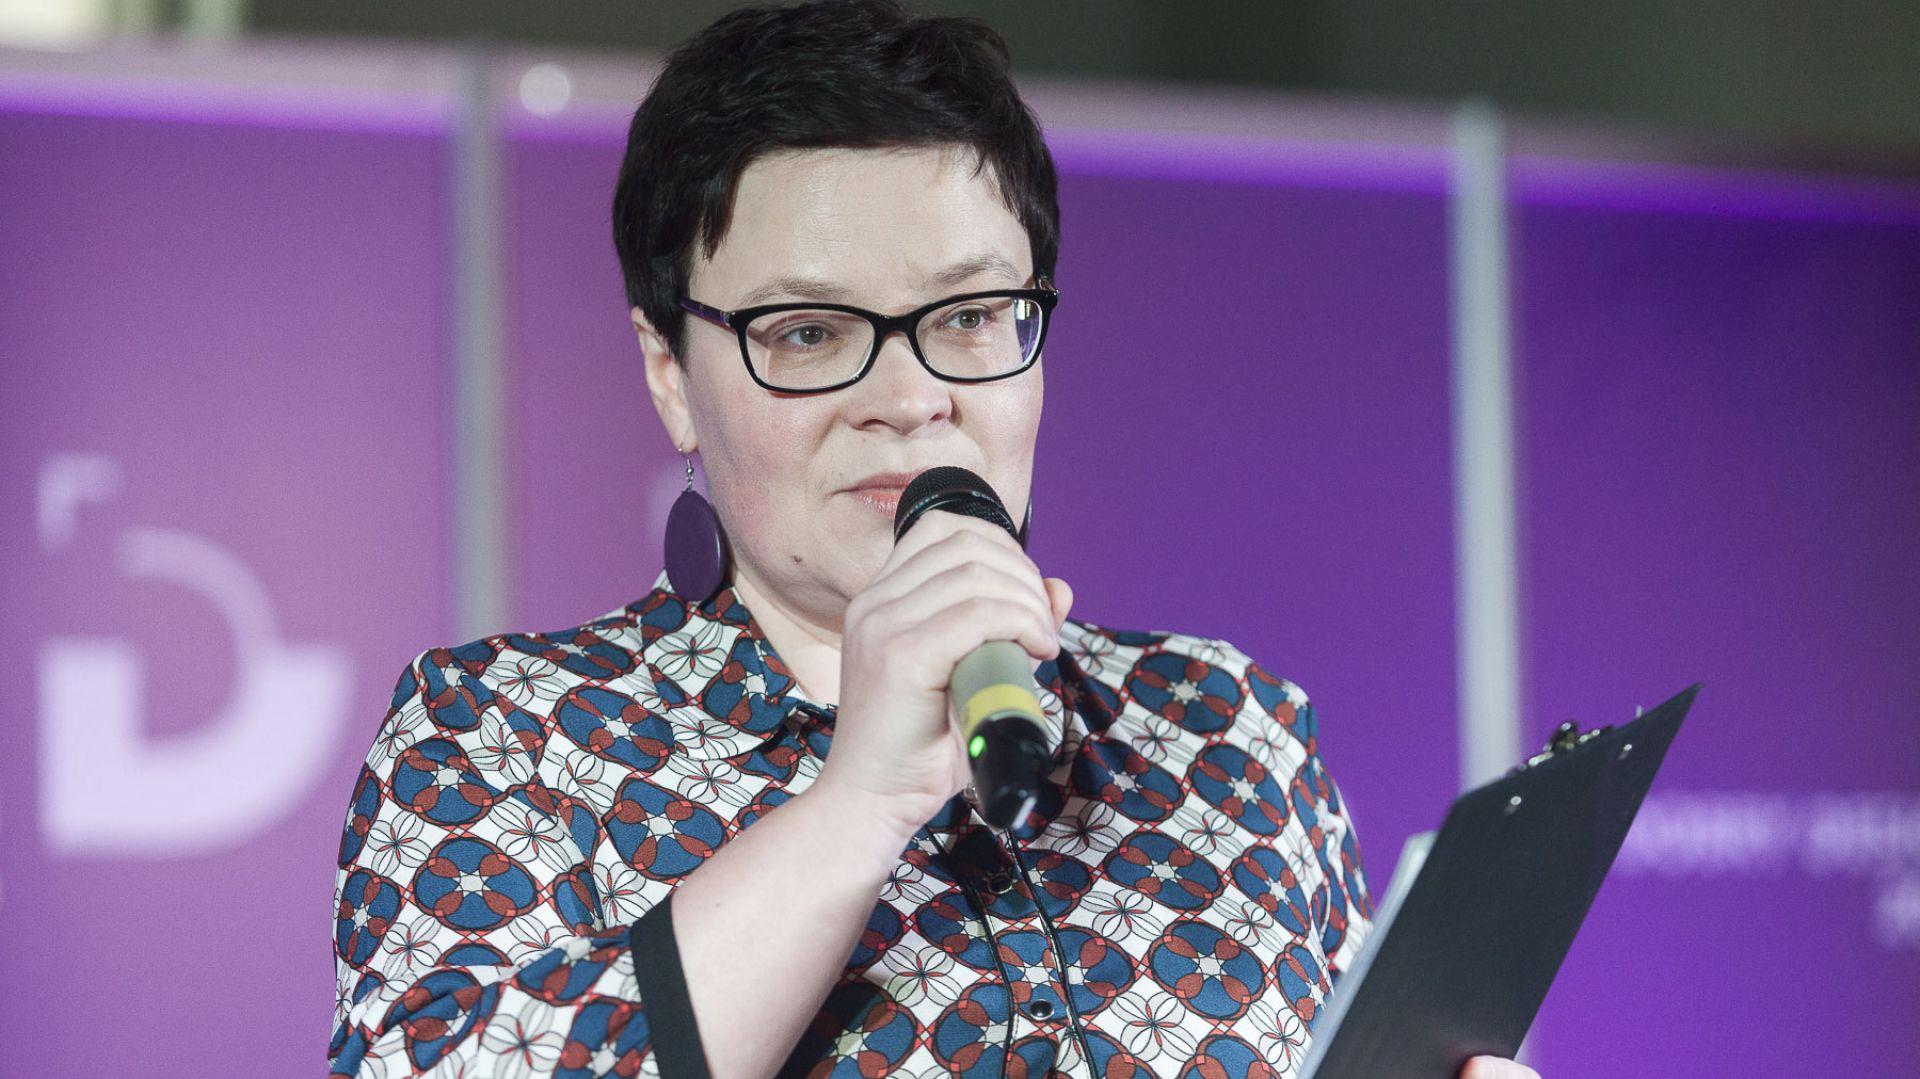 Justyna Łotowska